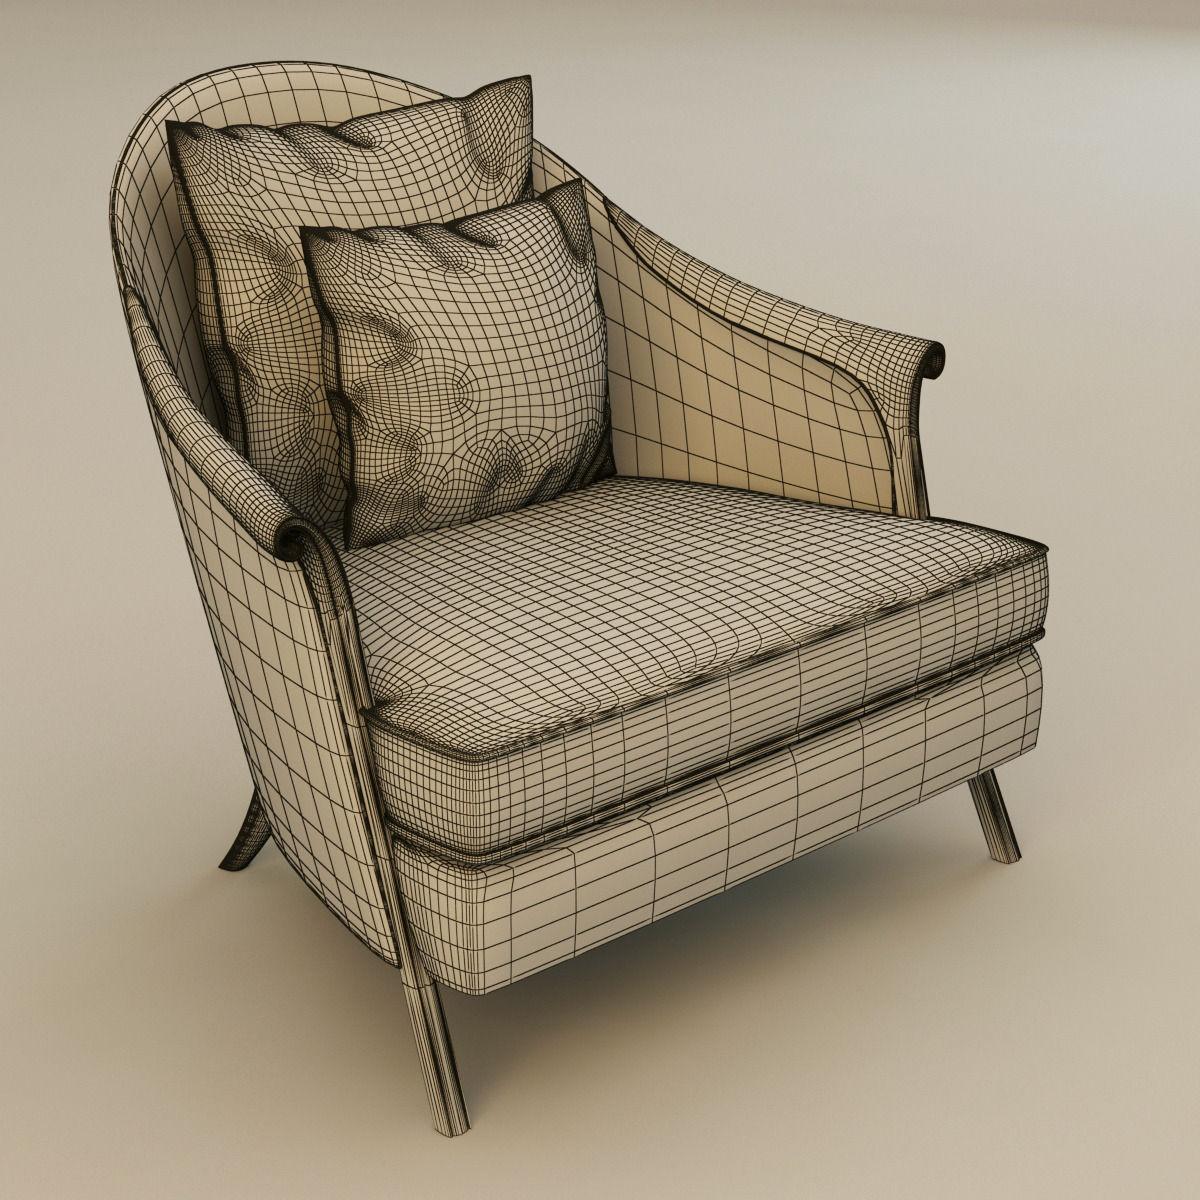 Christopher guy poltrona armchair 3d model max obj 3ds fbx for Poltrona 3d